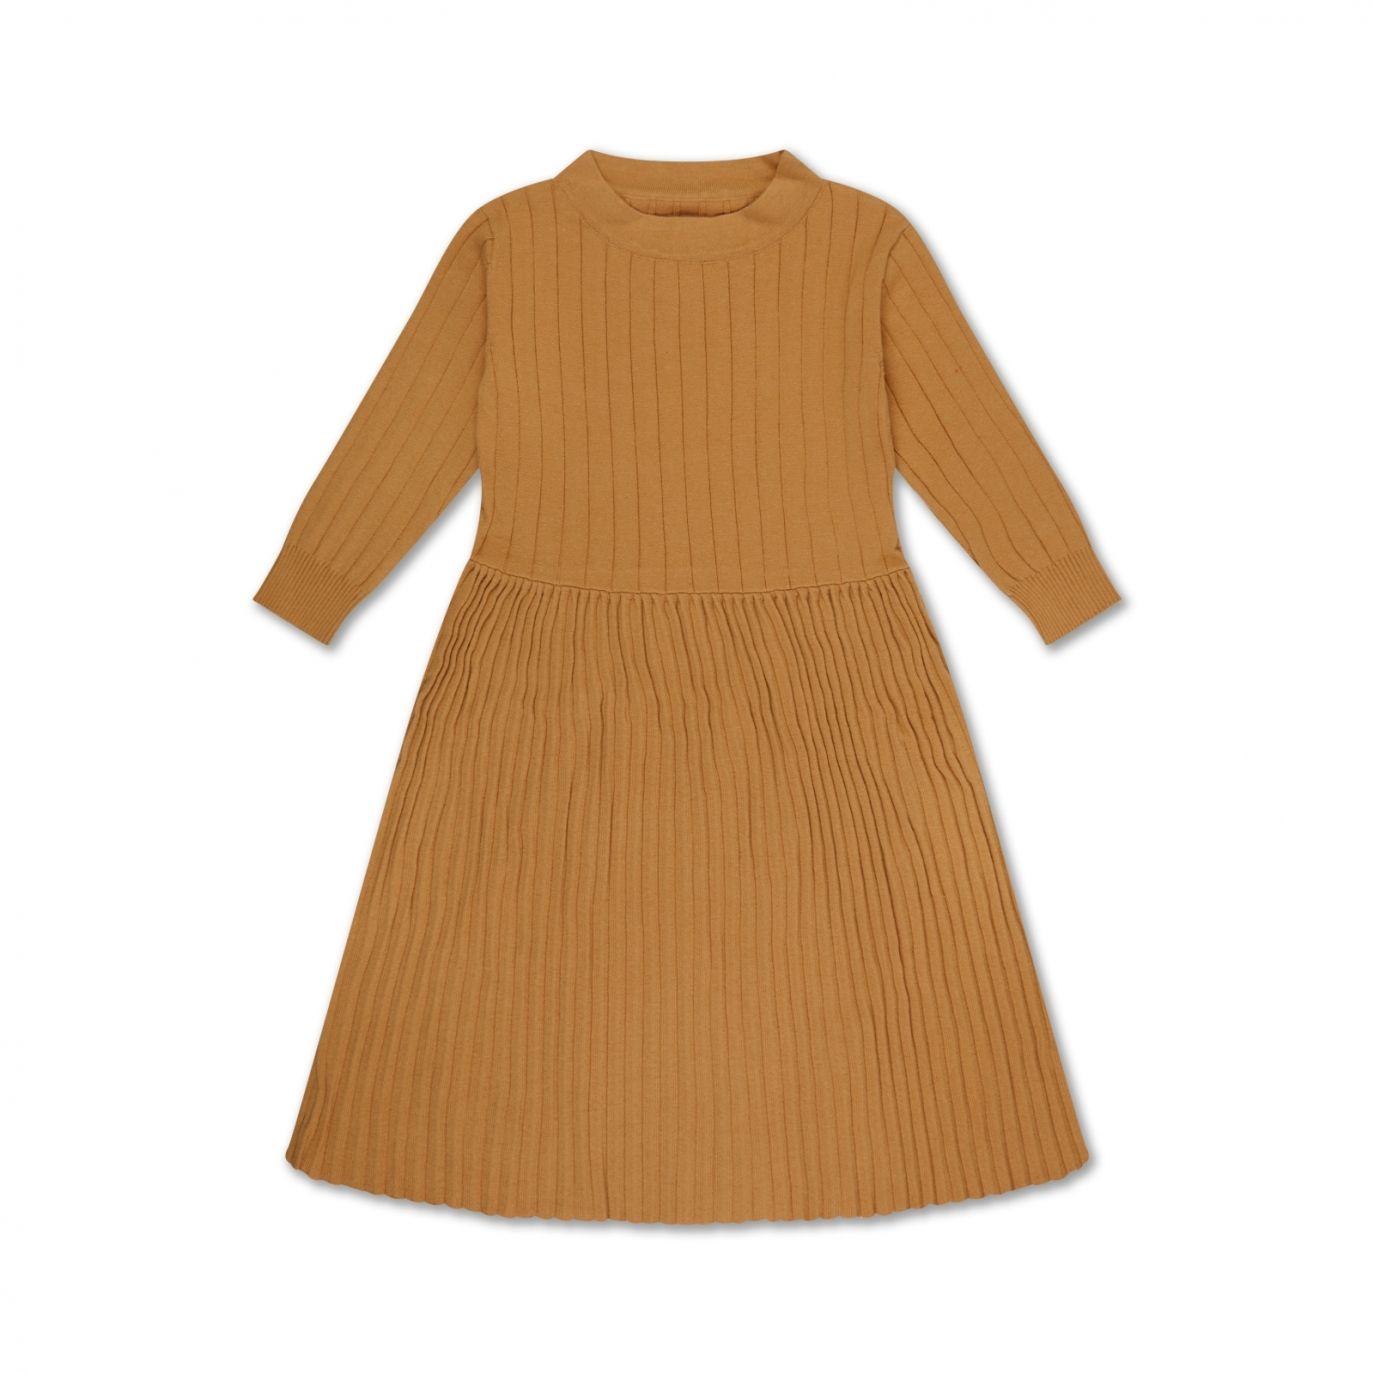 Repose AMS Knit Dress Smooth Camel Brown